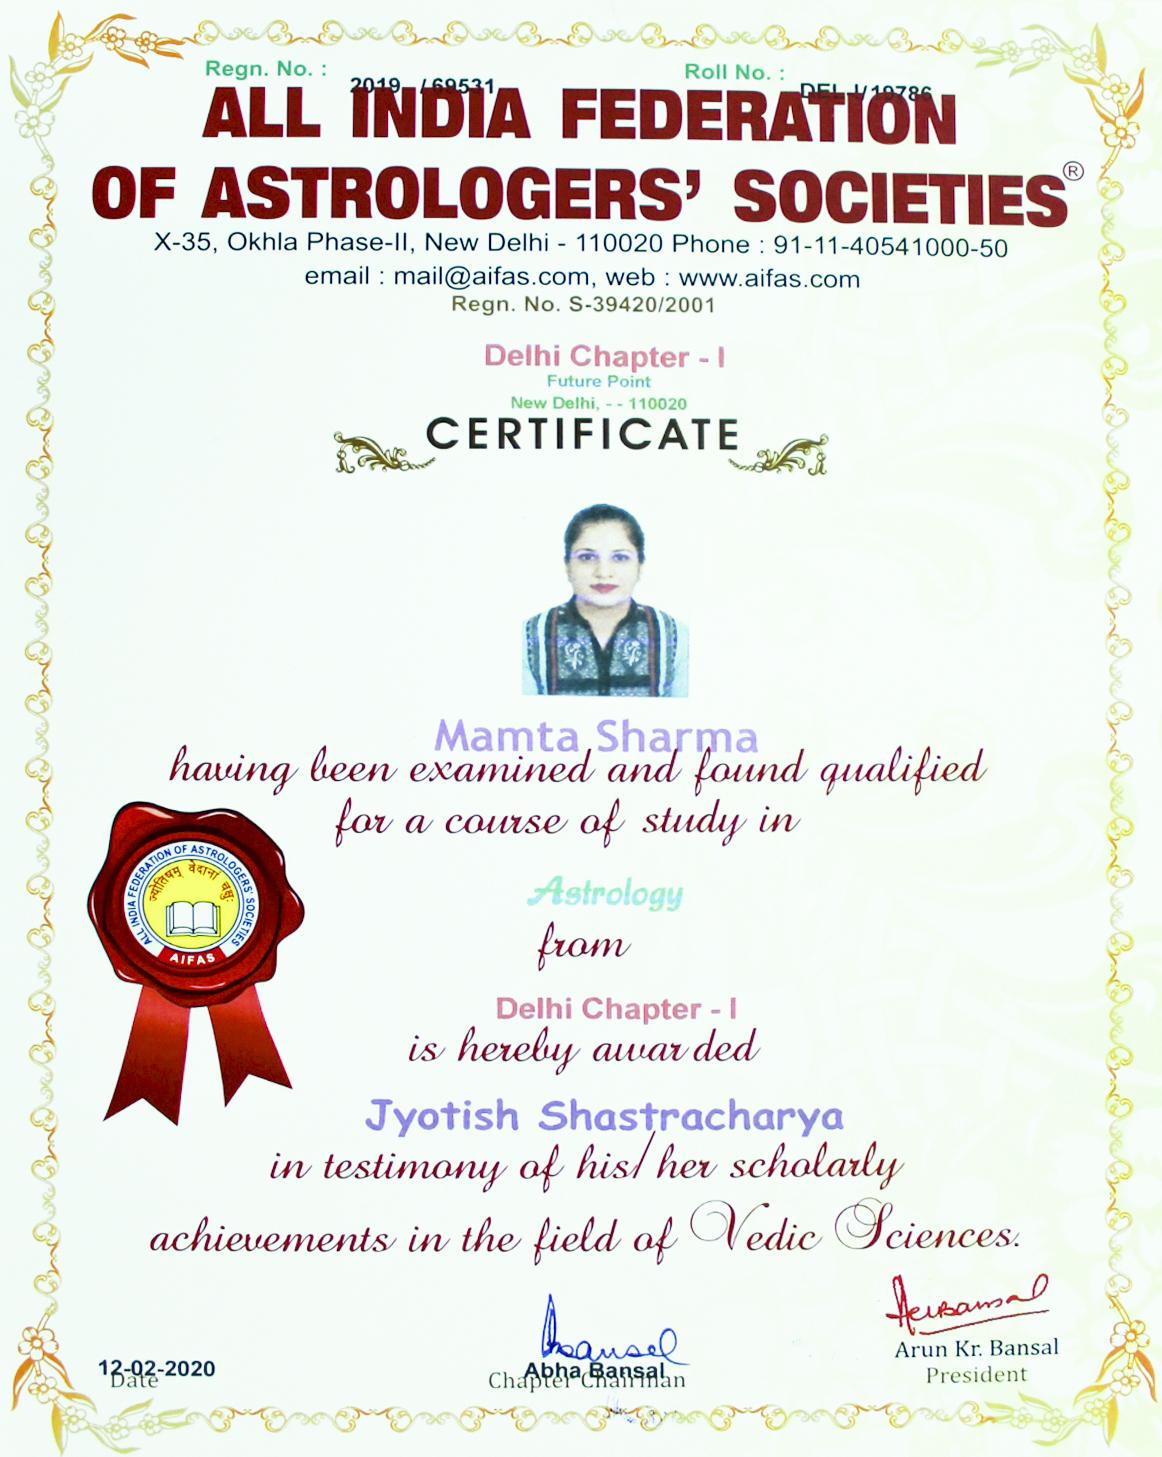 Jyotish SJyotish Shastracharya Astrology Certificate Dr. Mamta Sharma